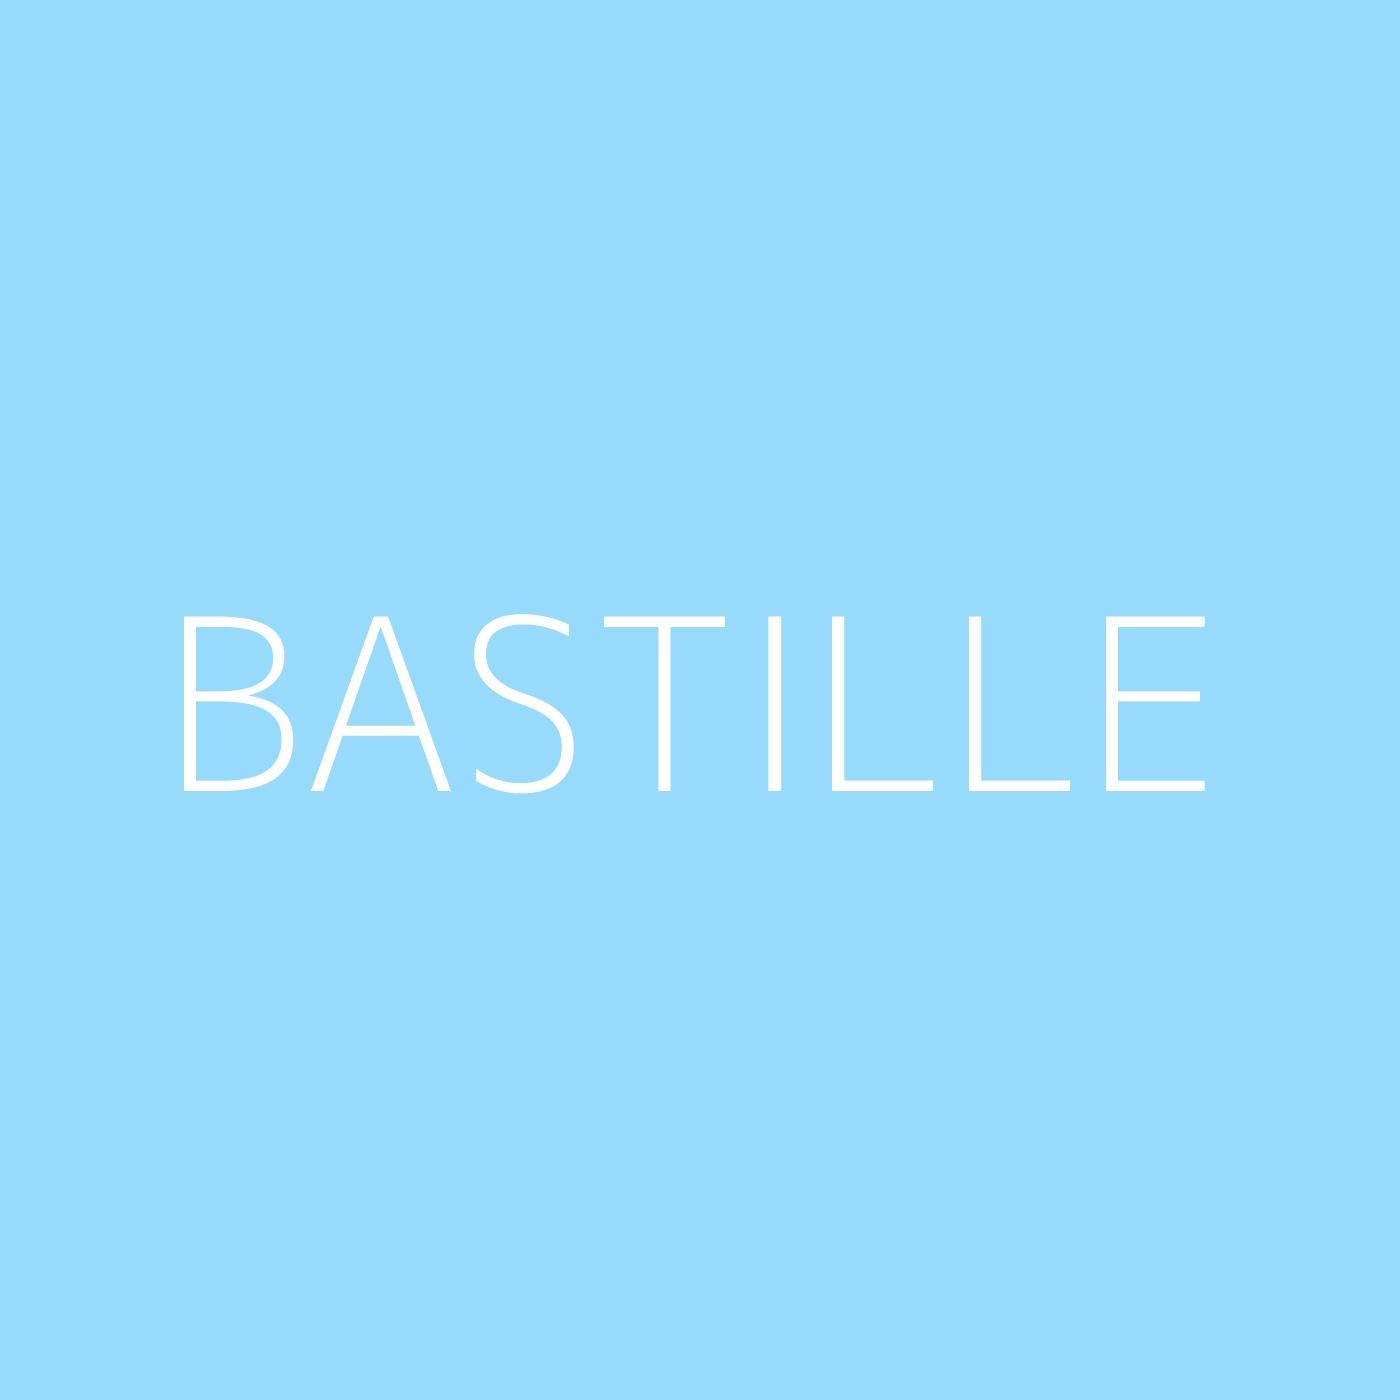 Bastille Playlist Artwork